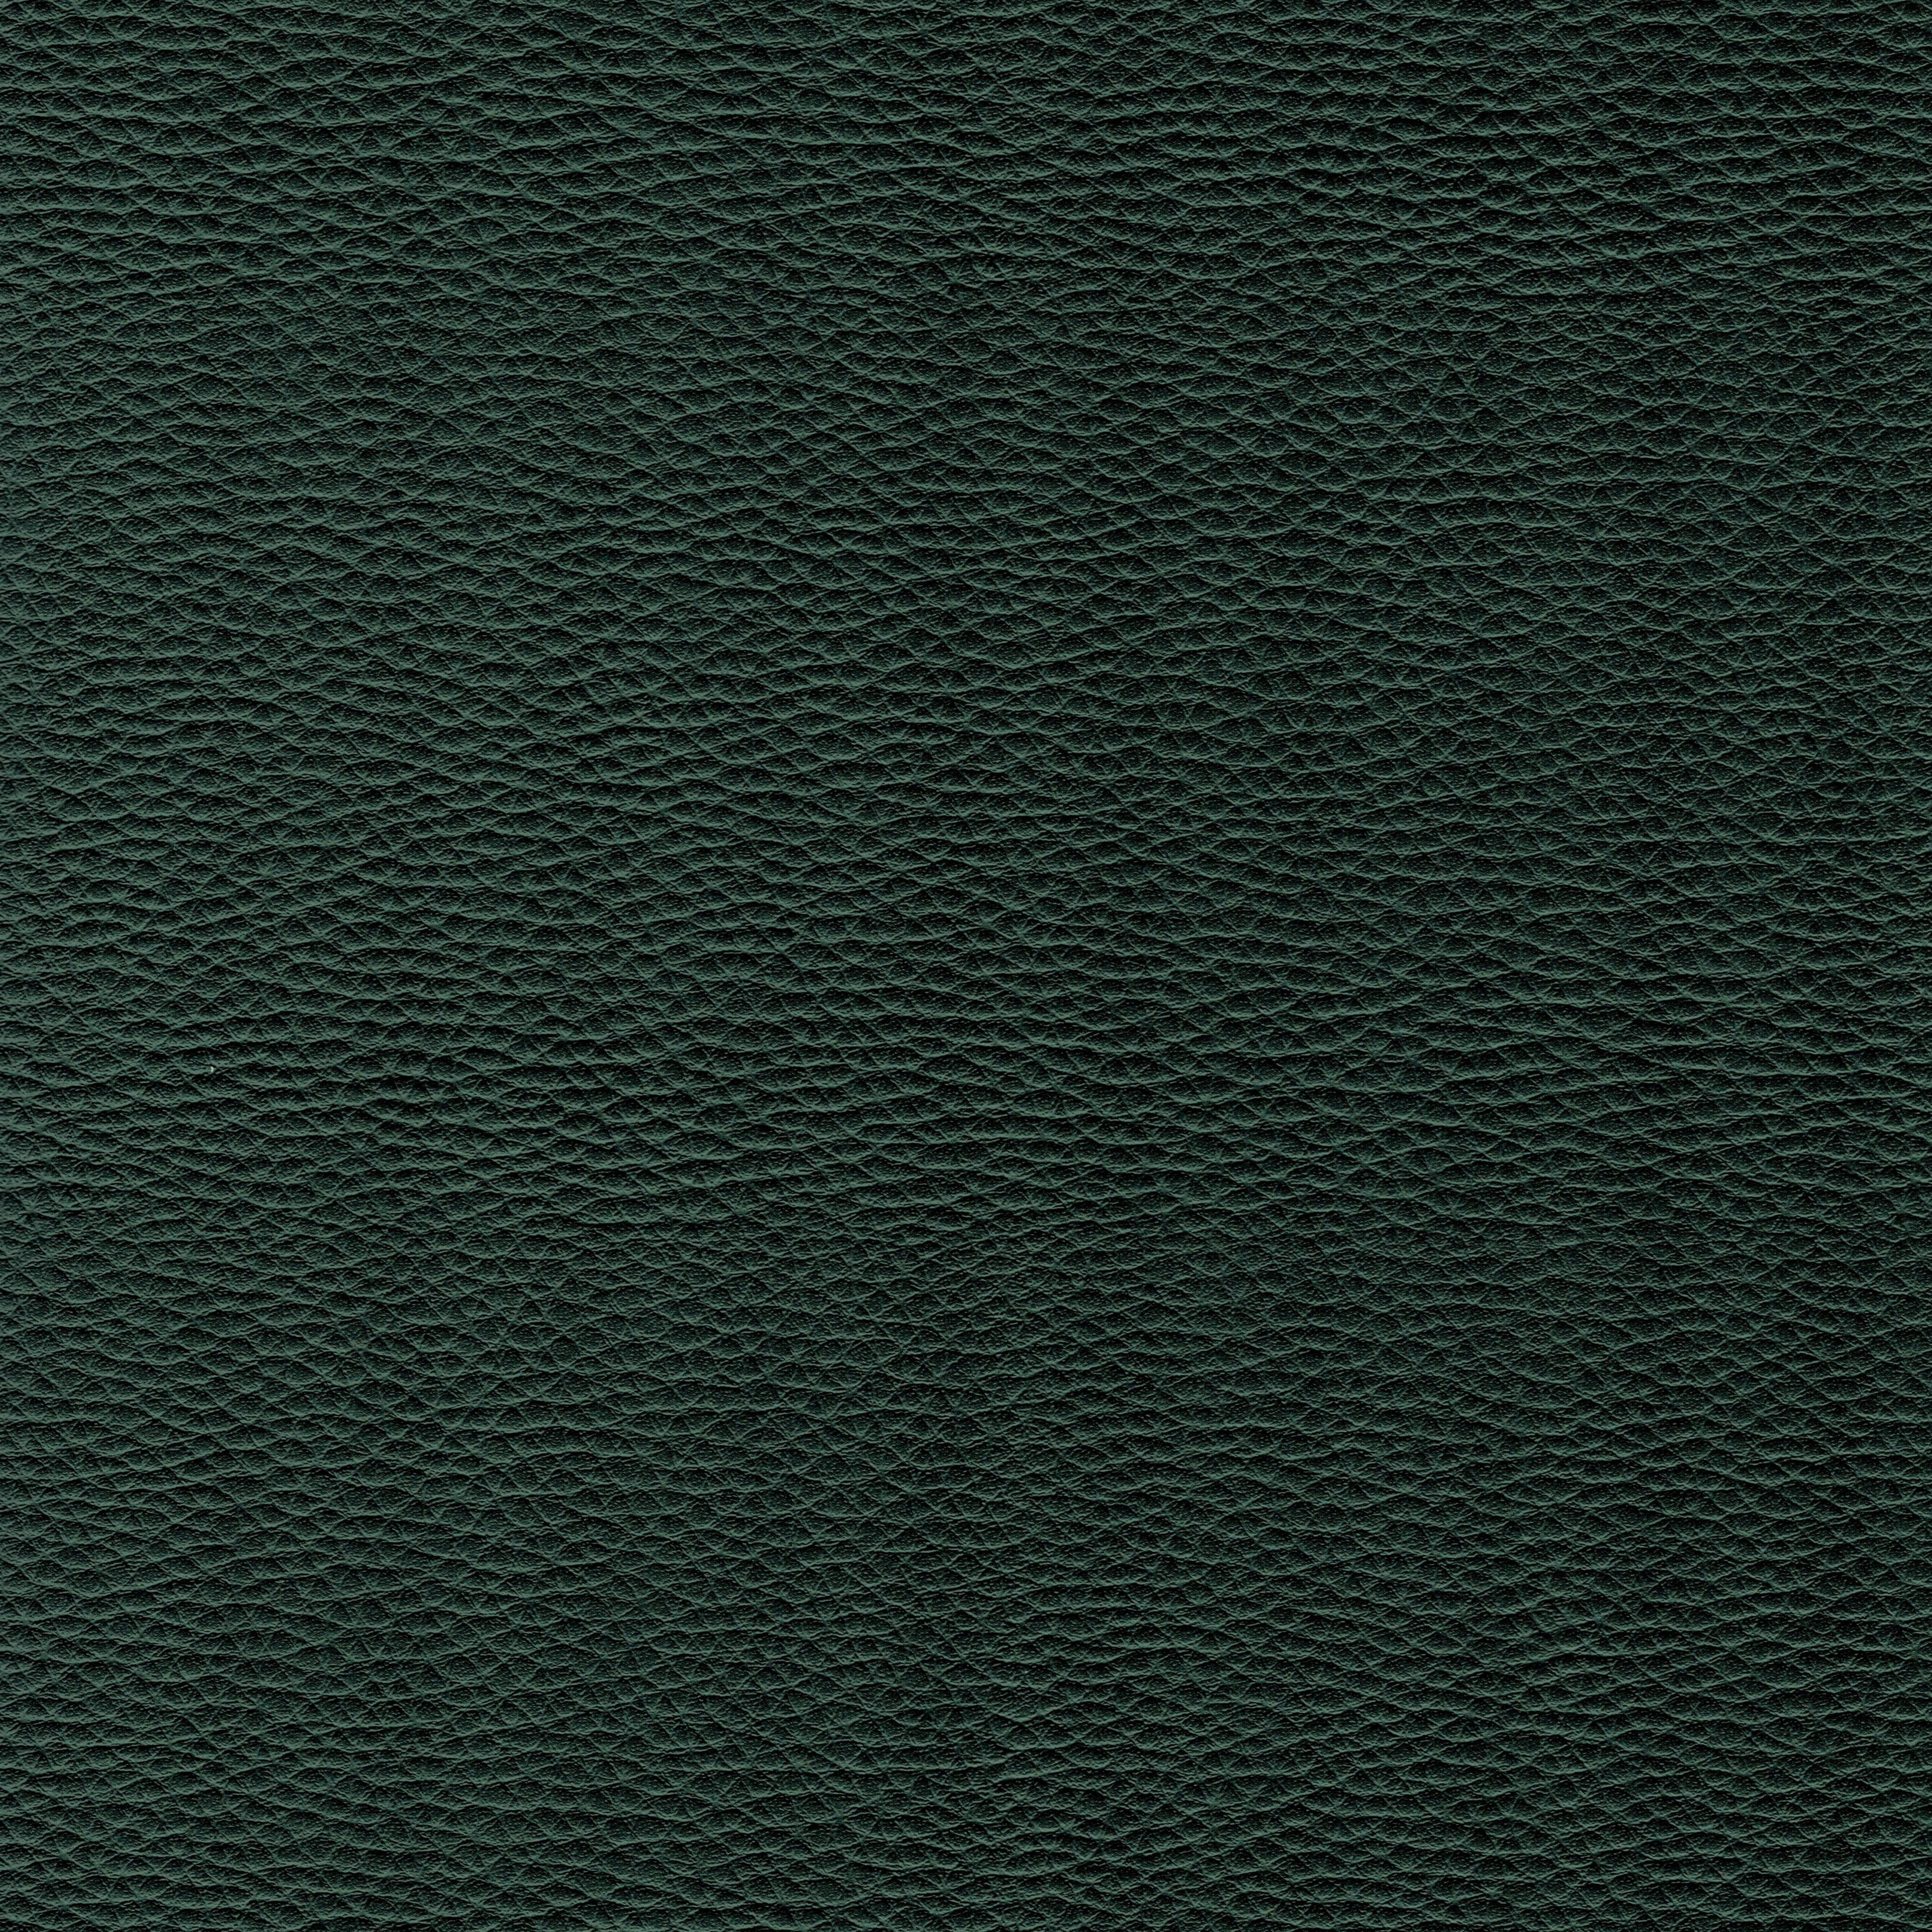 dunkelgrün DOL44